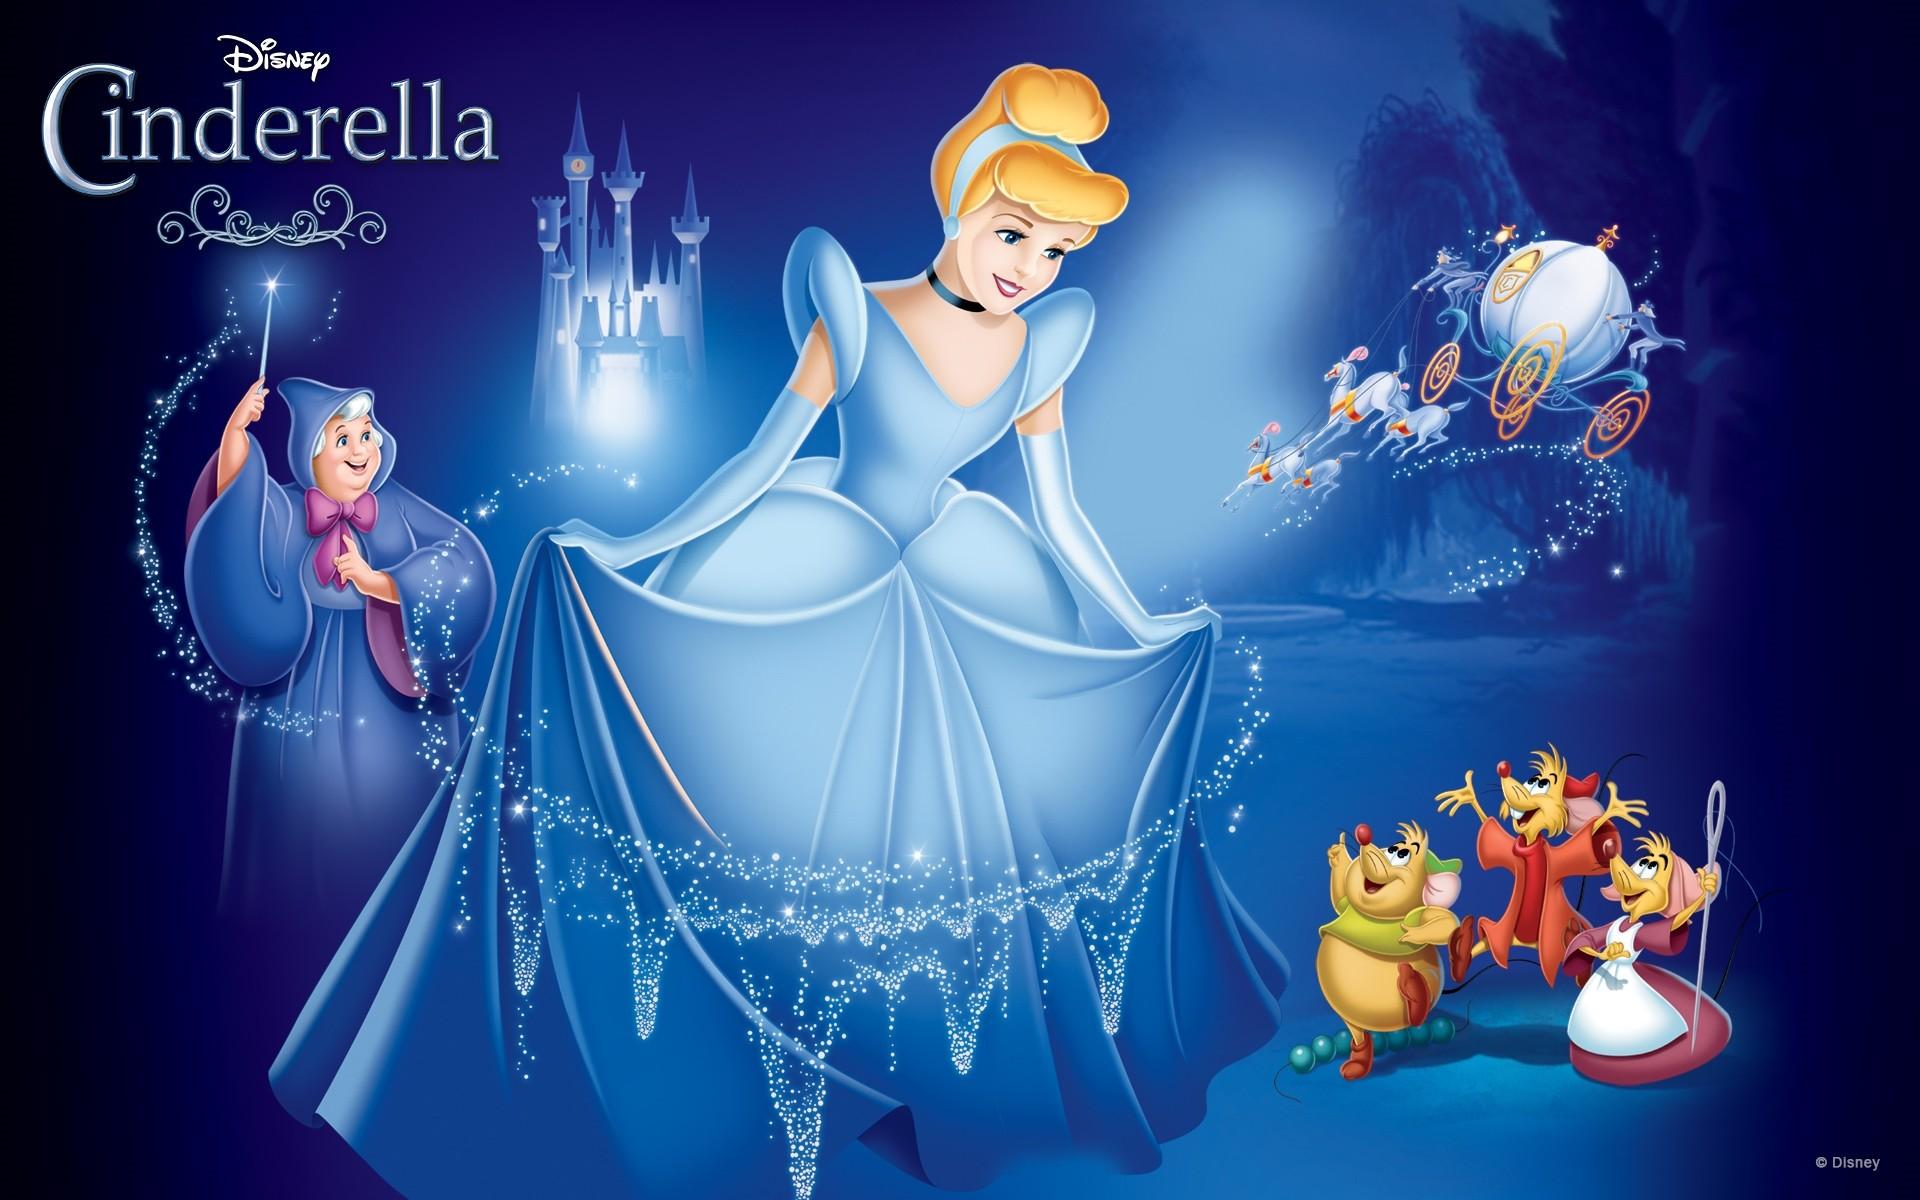 Disney Movies Hd Wallpapers: Walt Disney Desktop Wallpaper ·①